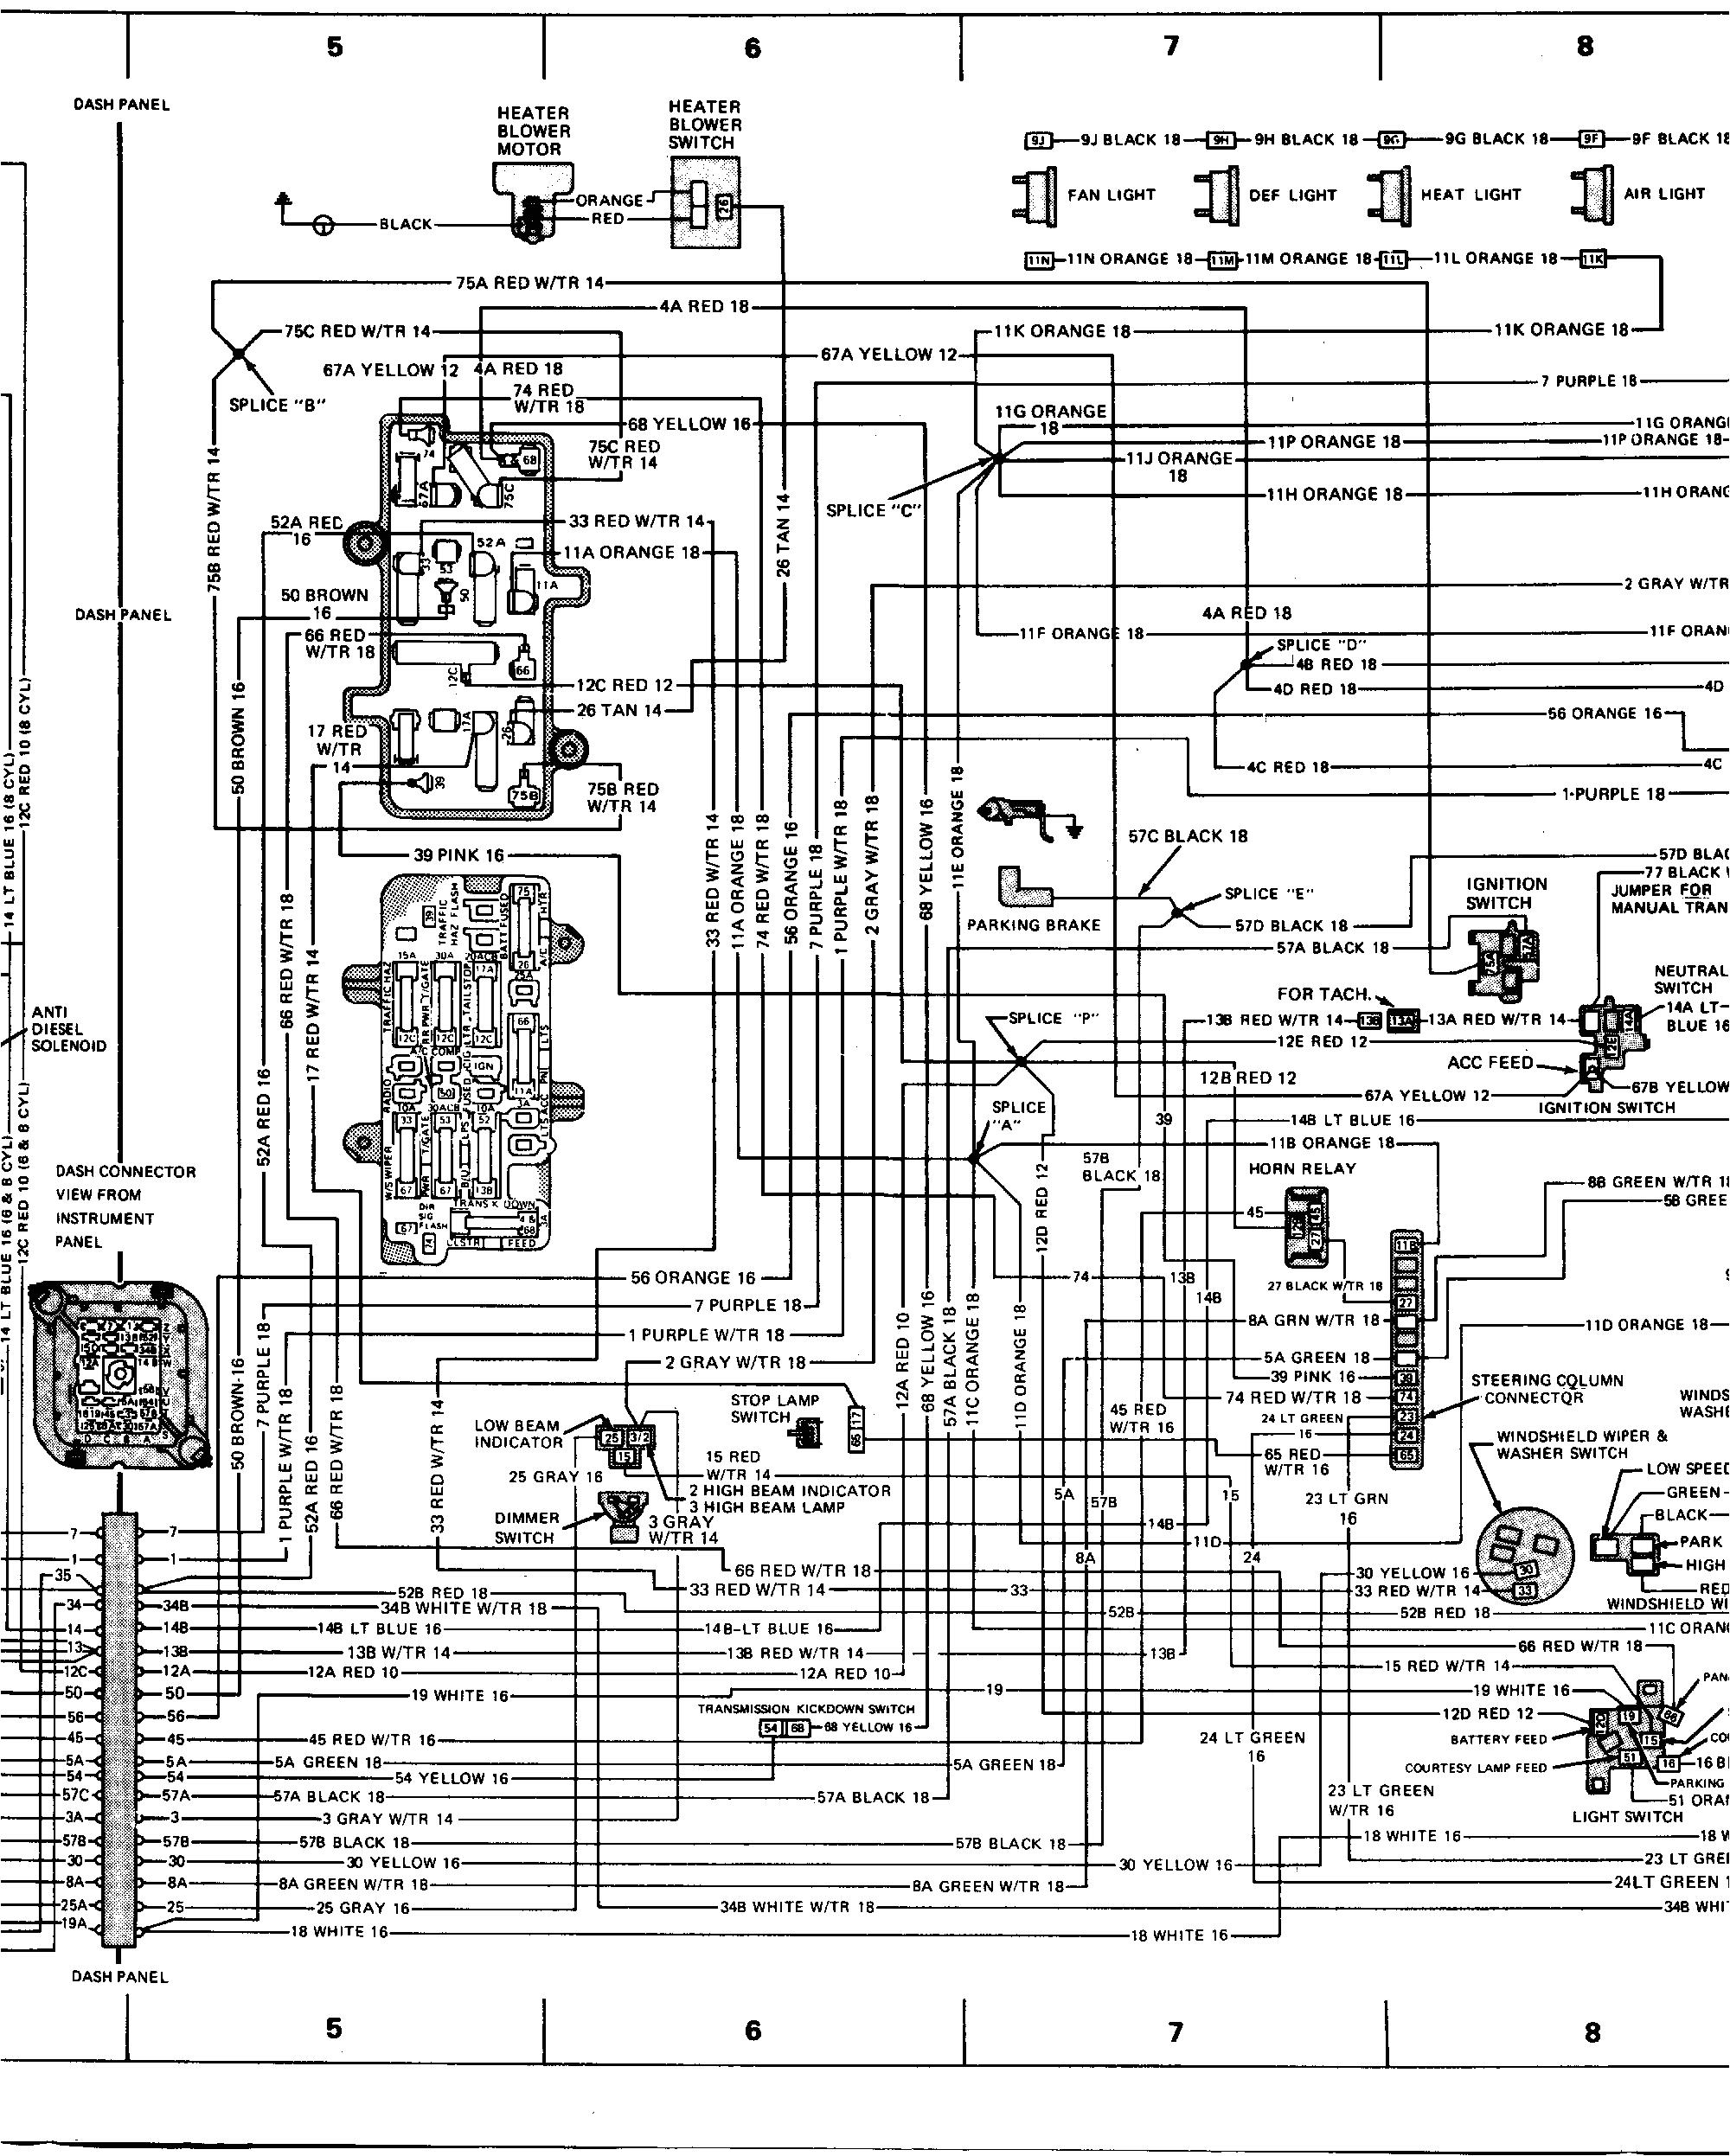 1971 Jeep Cj5 Wiring Diagram Mastercool Motor Wiring Diagram Wiring Library